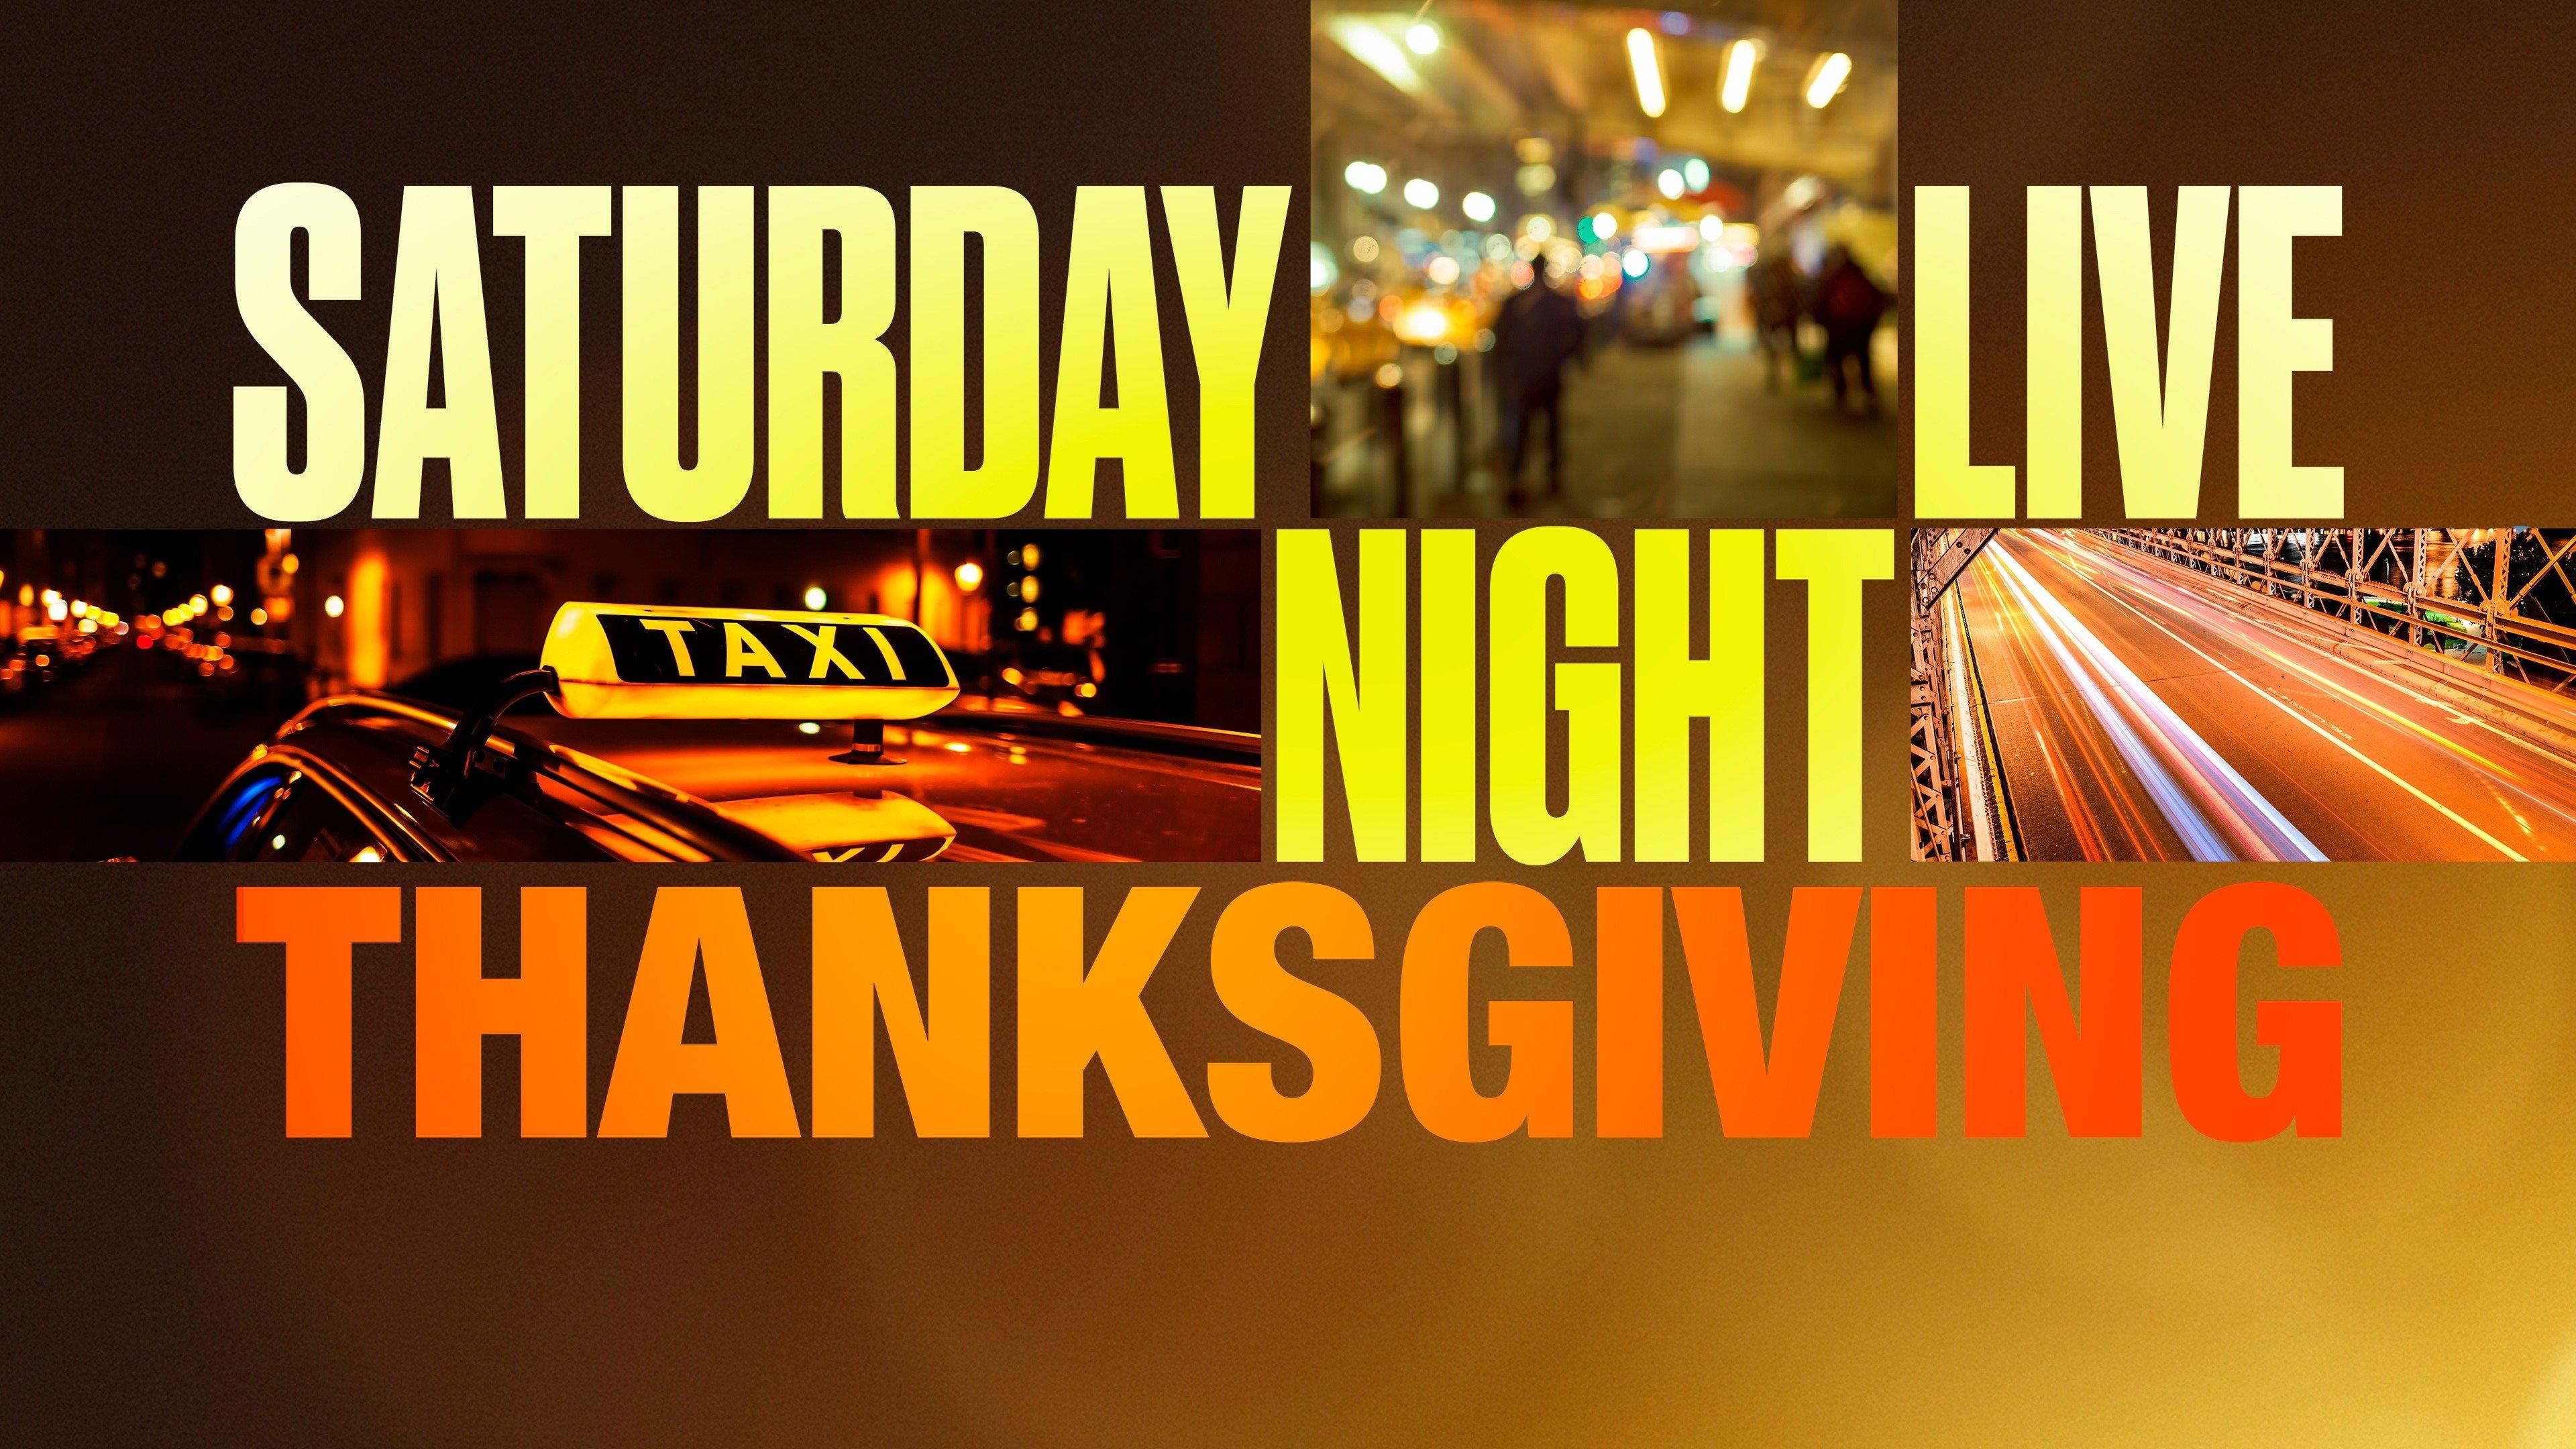 A Saturday Night Live Thanksgiving